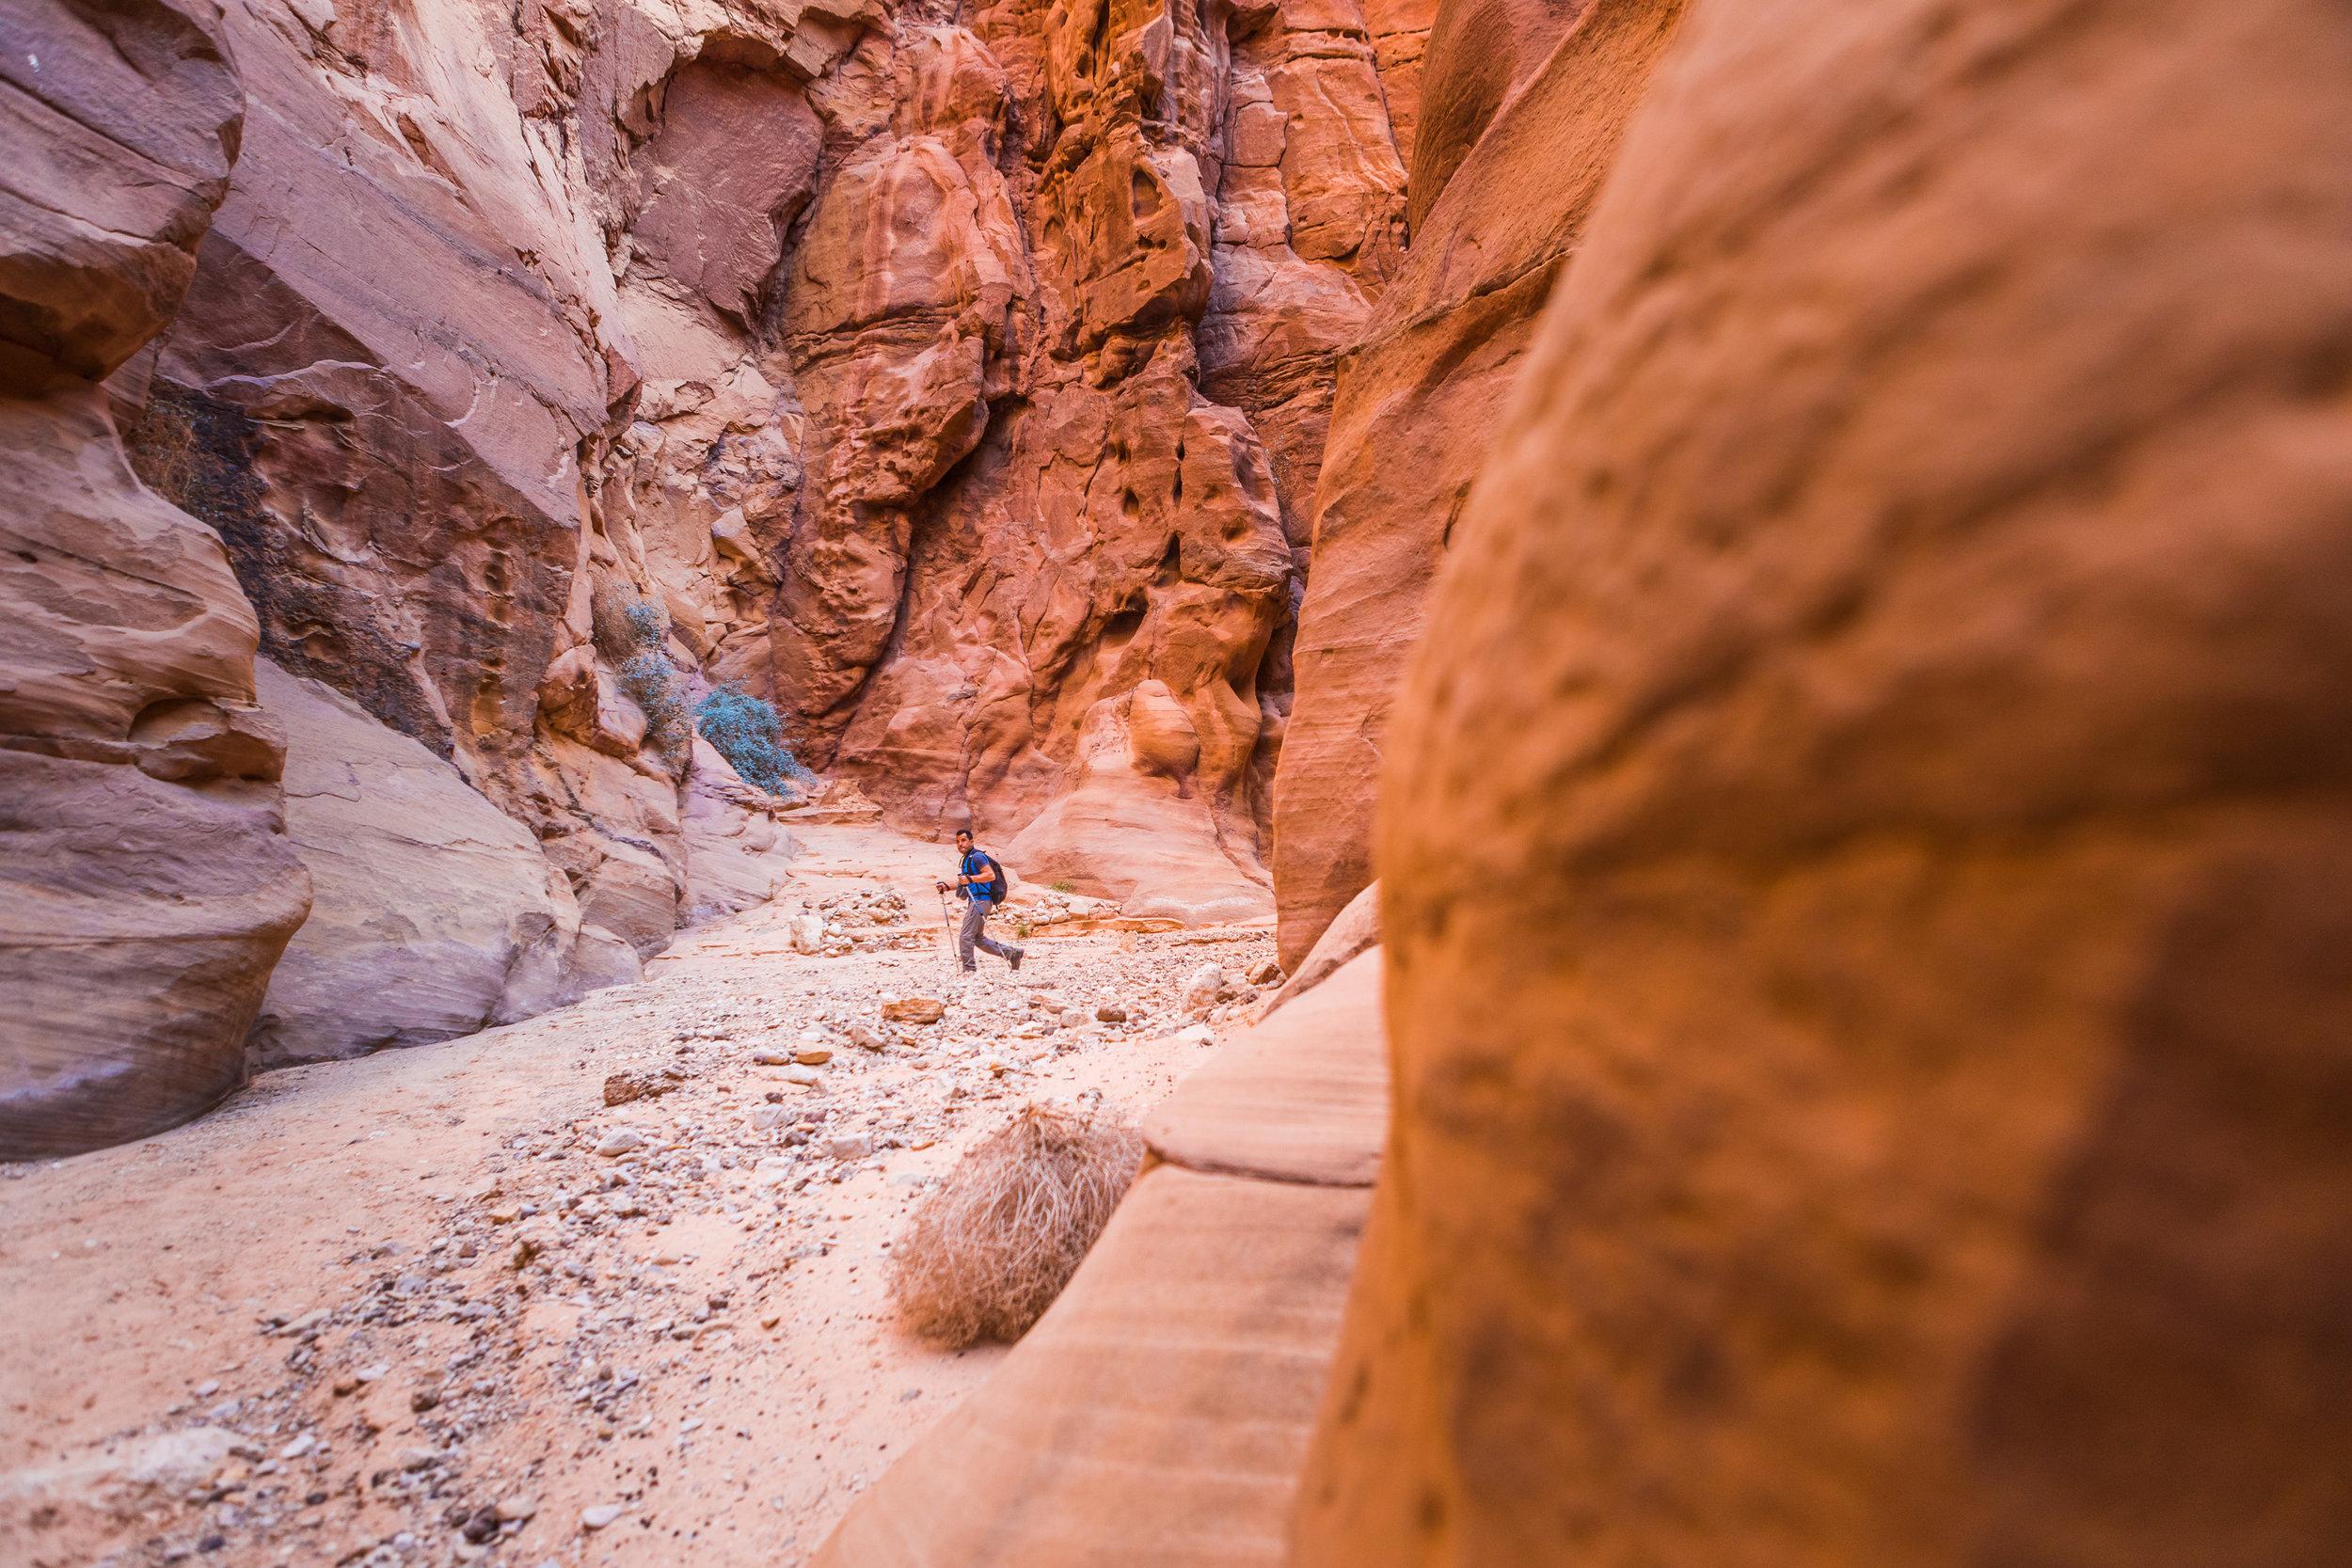 Ali-Barqawi-Studios-Explore-Series-Travel-Adventure-Documentary-